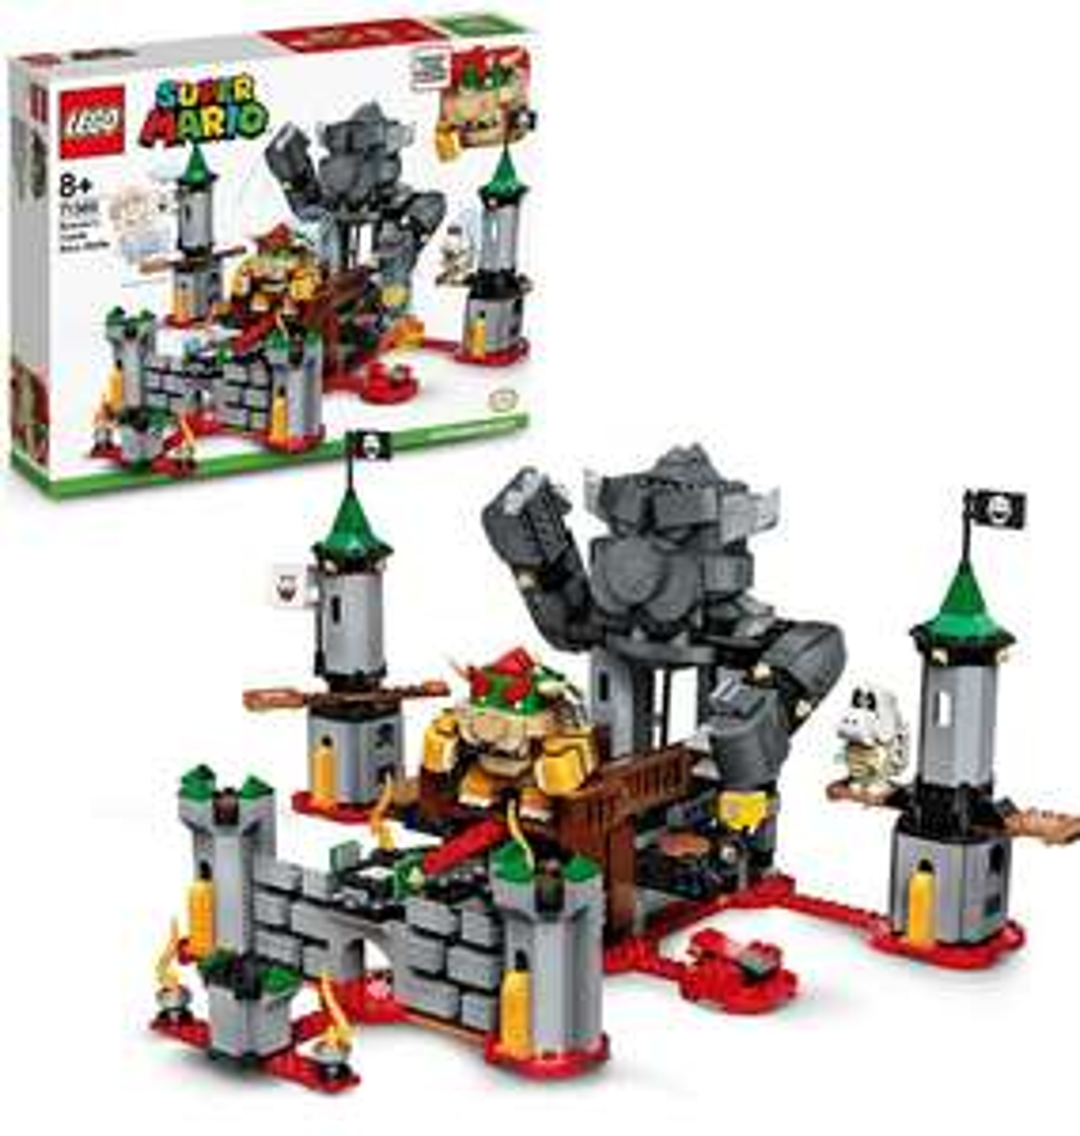 Lego Uitbreidingsset: Eindbaasgevecht op Bowsers kasteel (71369)